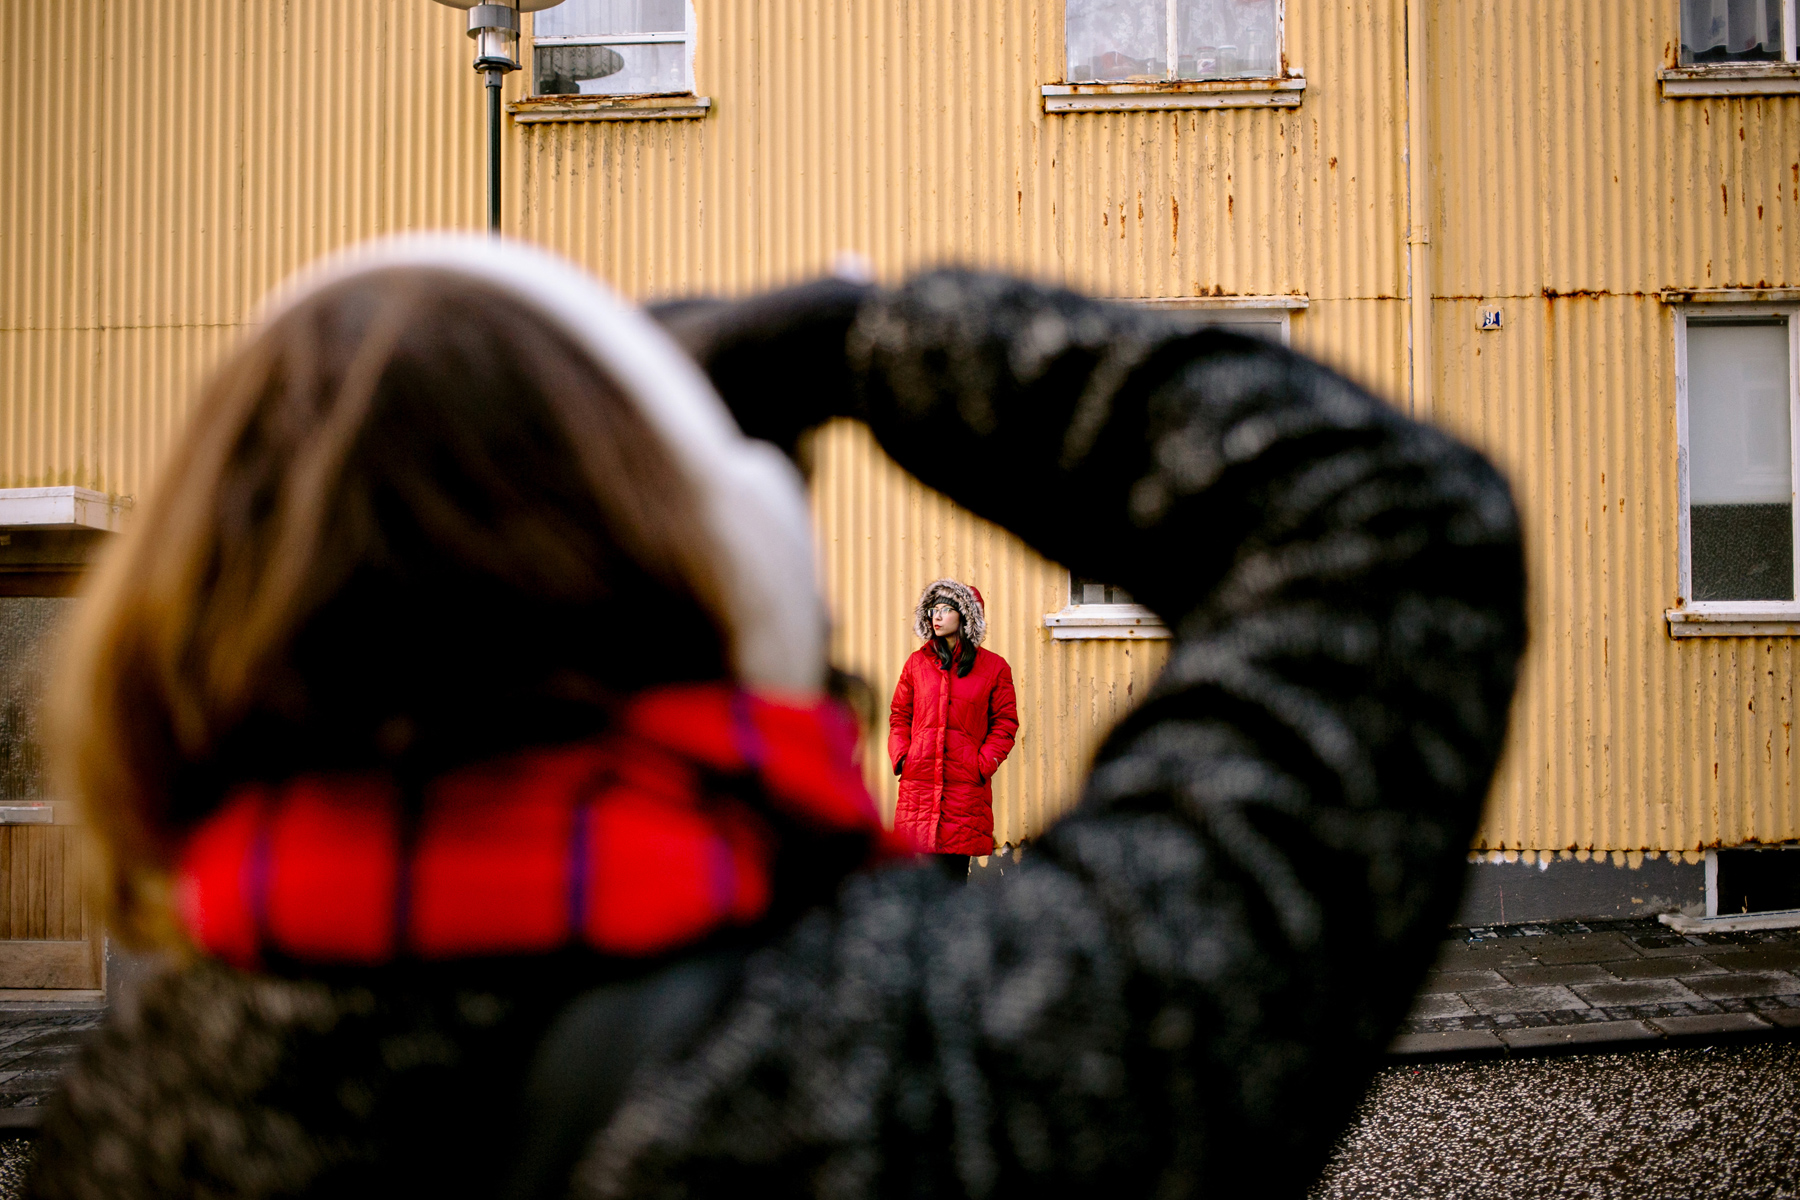 016-epic-iceland-photographer-portraits-kandisebrown-2016